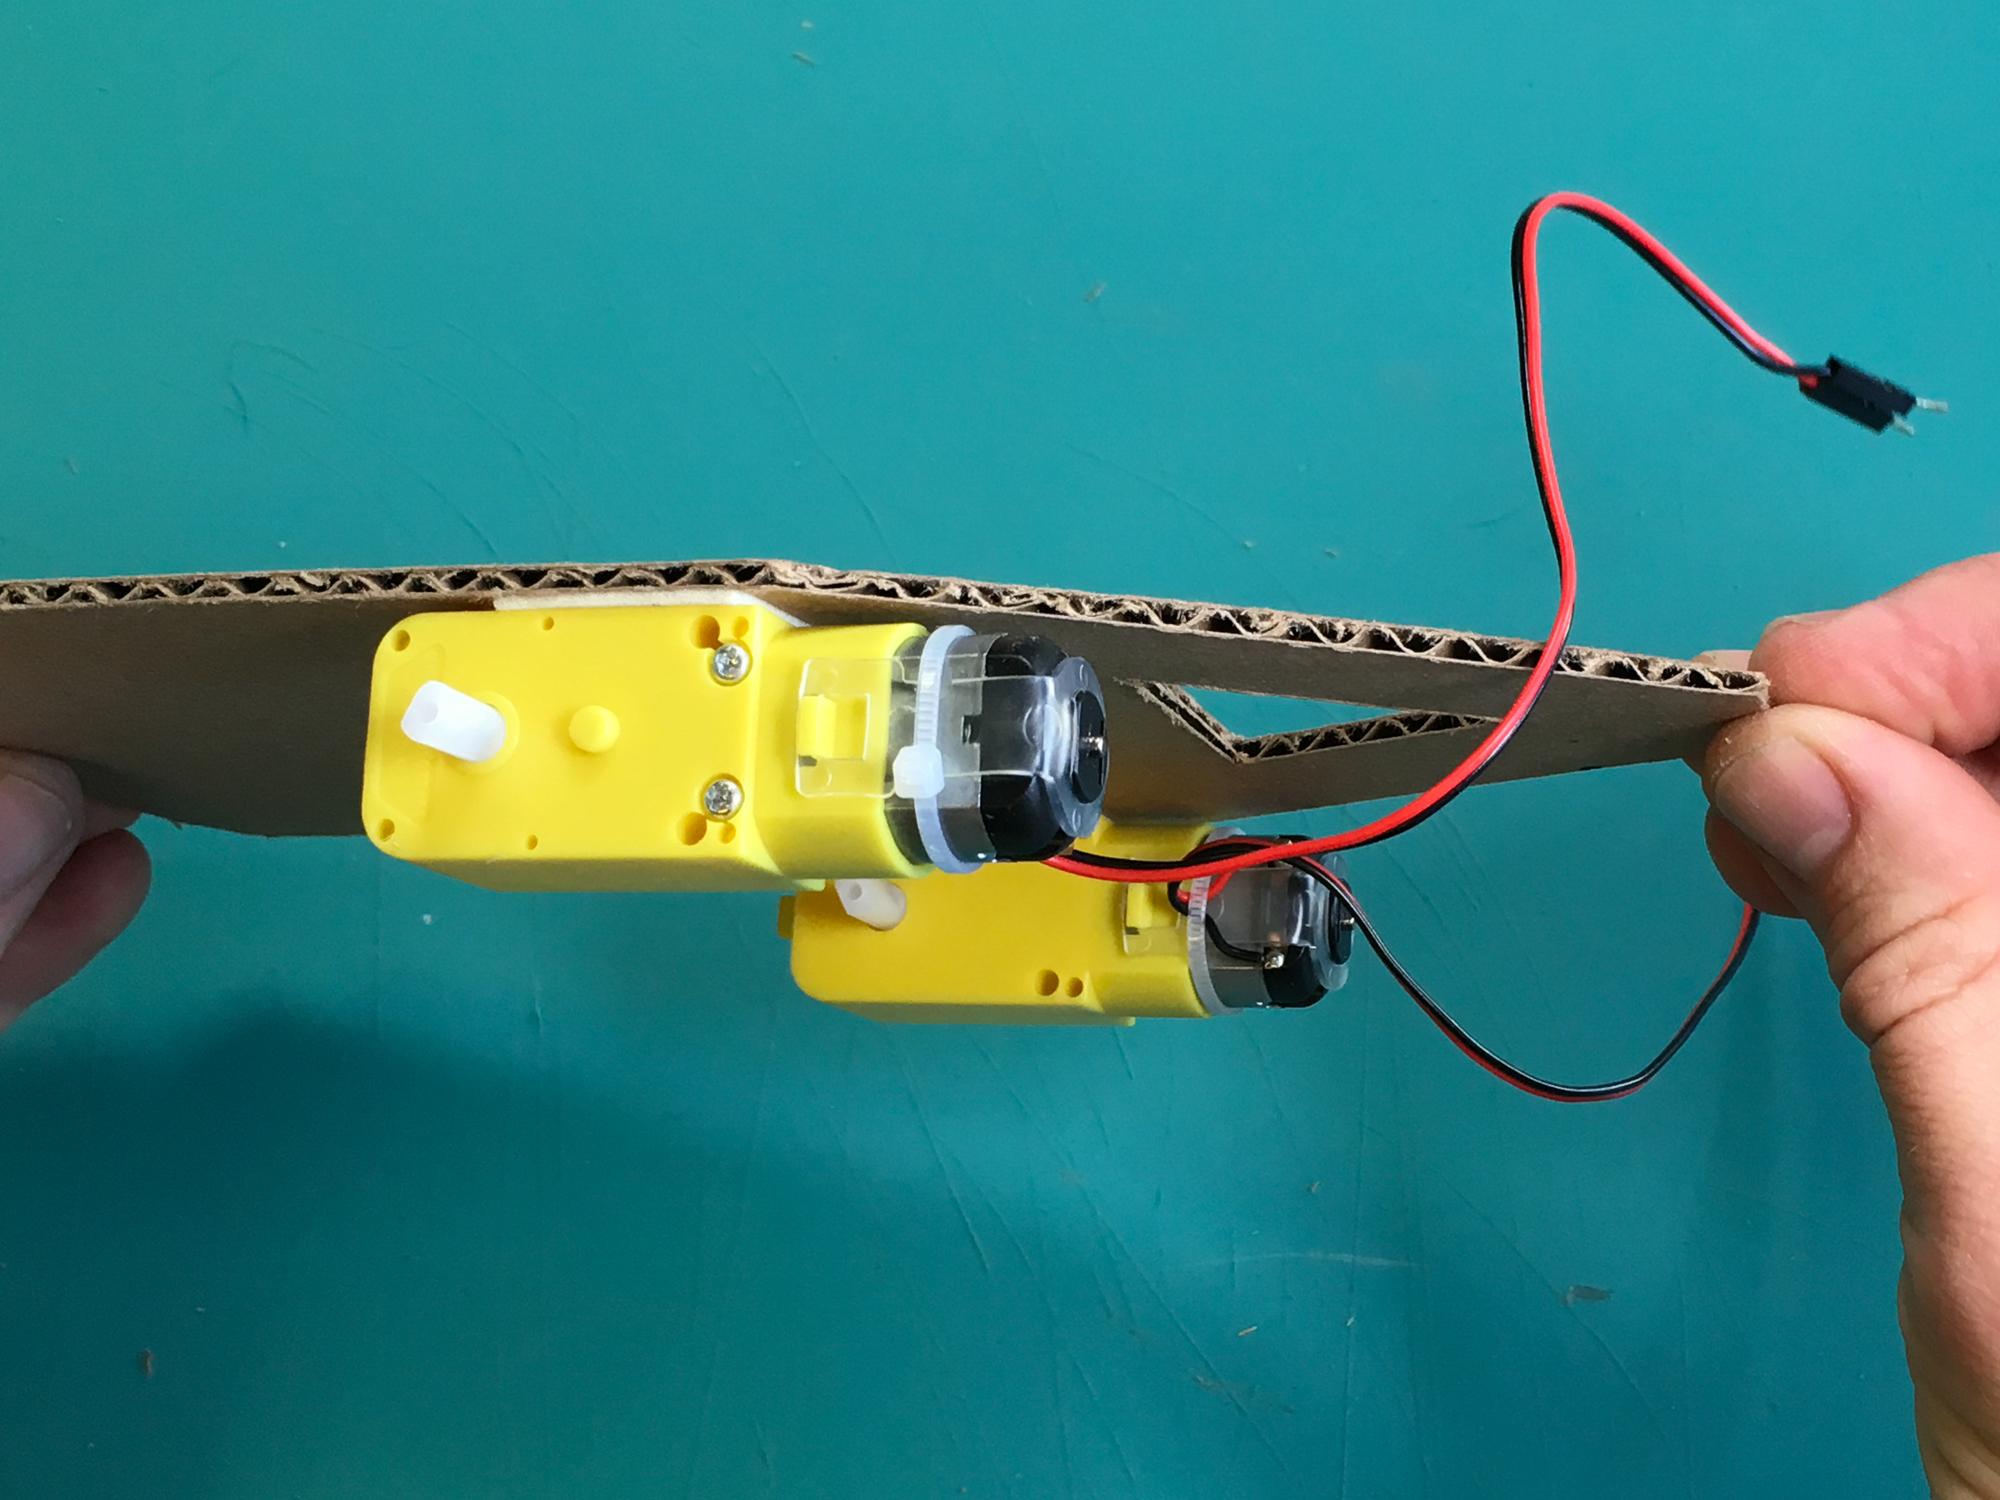 micropython___circuitpython_robotics___cnc_bumperBot_IMG_3468_2k.jpg